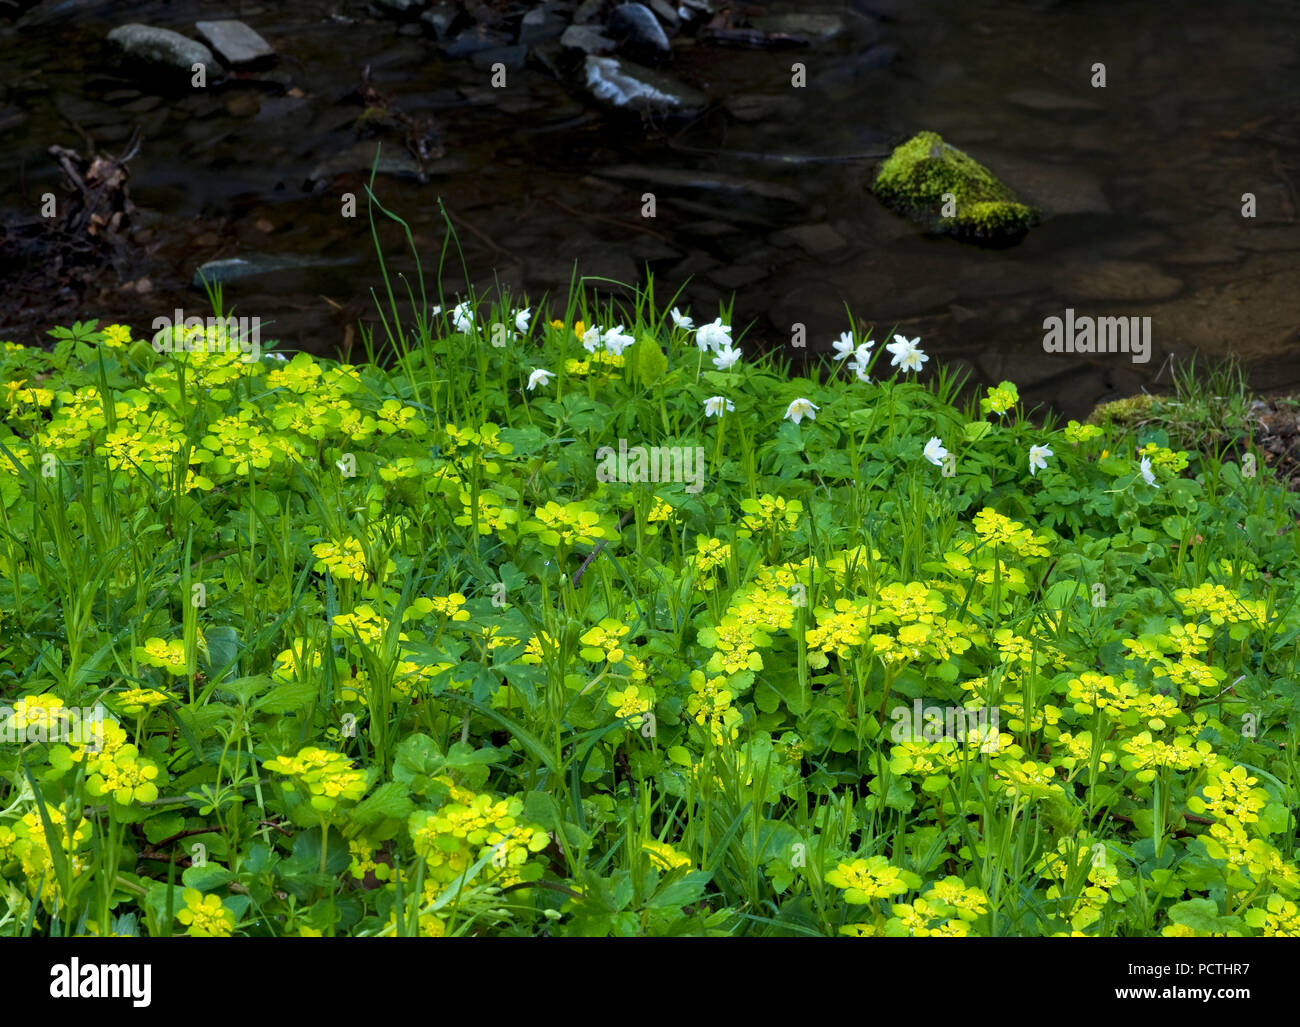 Germany, Hesse, Vöhl, nature and national park Kellerwald-Edersee, creek with alternate-leaved golden-saxifrage, primeval forest trail - Stock Image